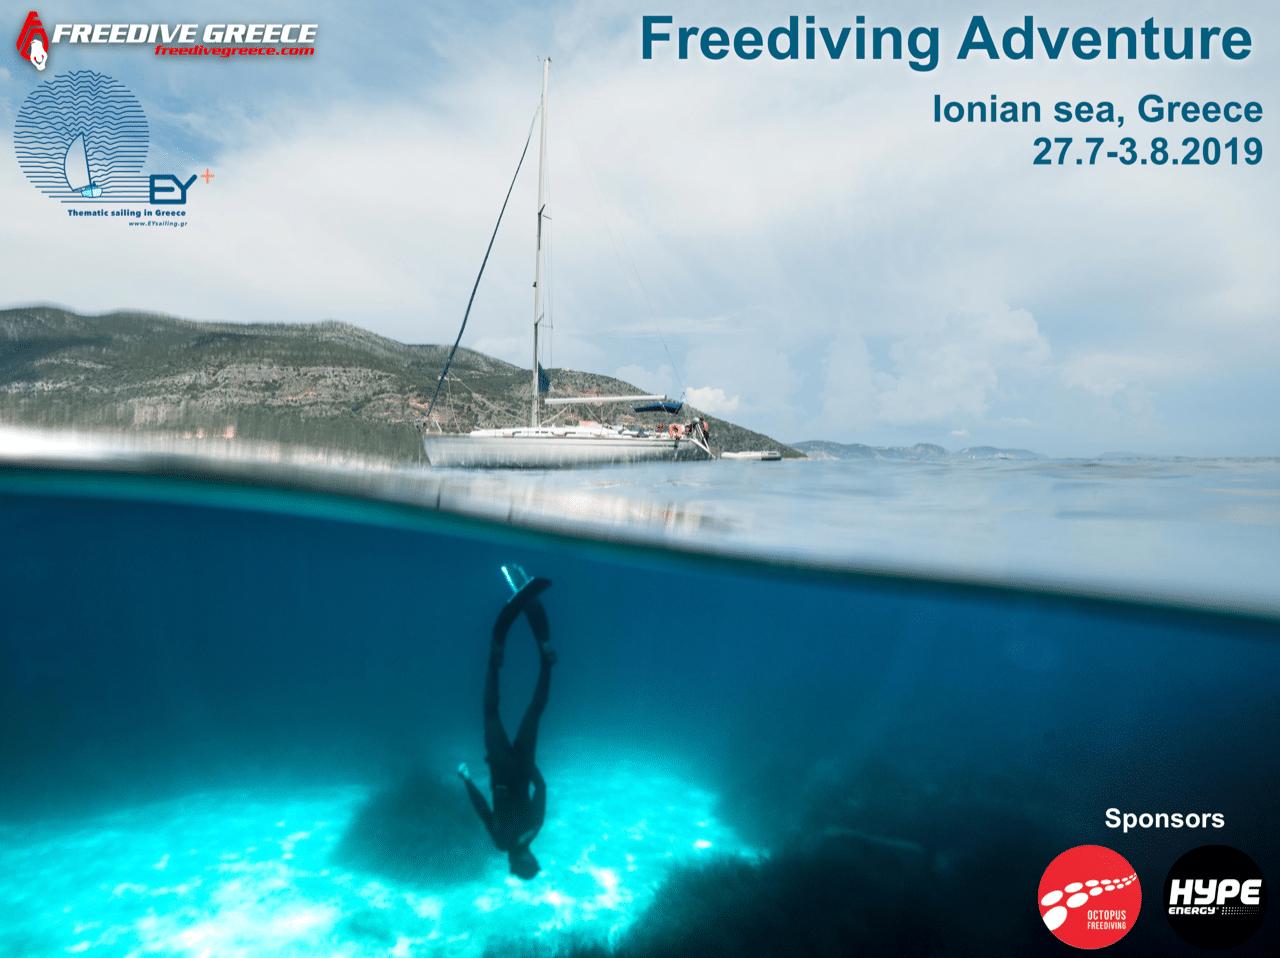 Third Annual Freediving/Sailing Trip Off The Greek Coast Set For This Summer